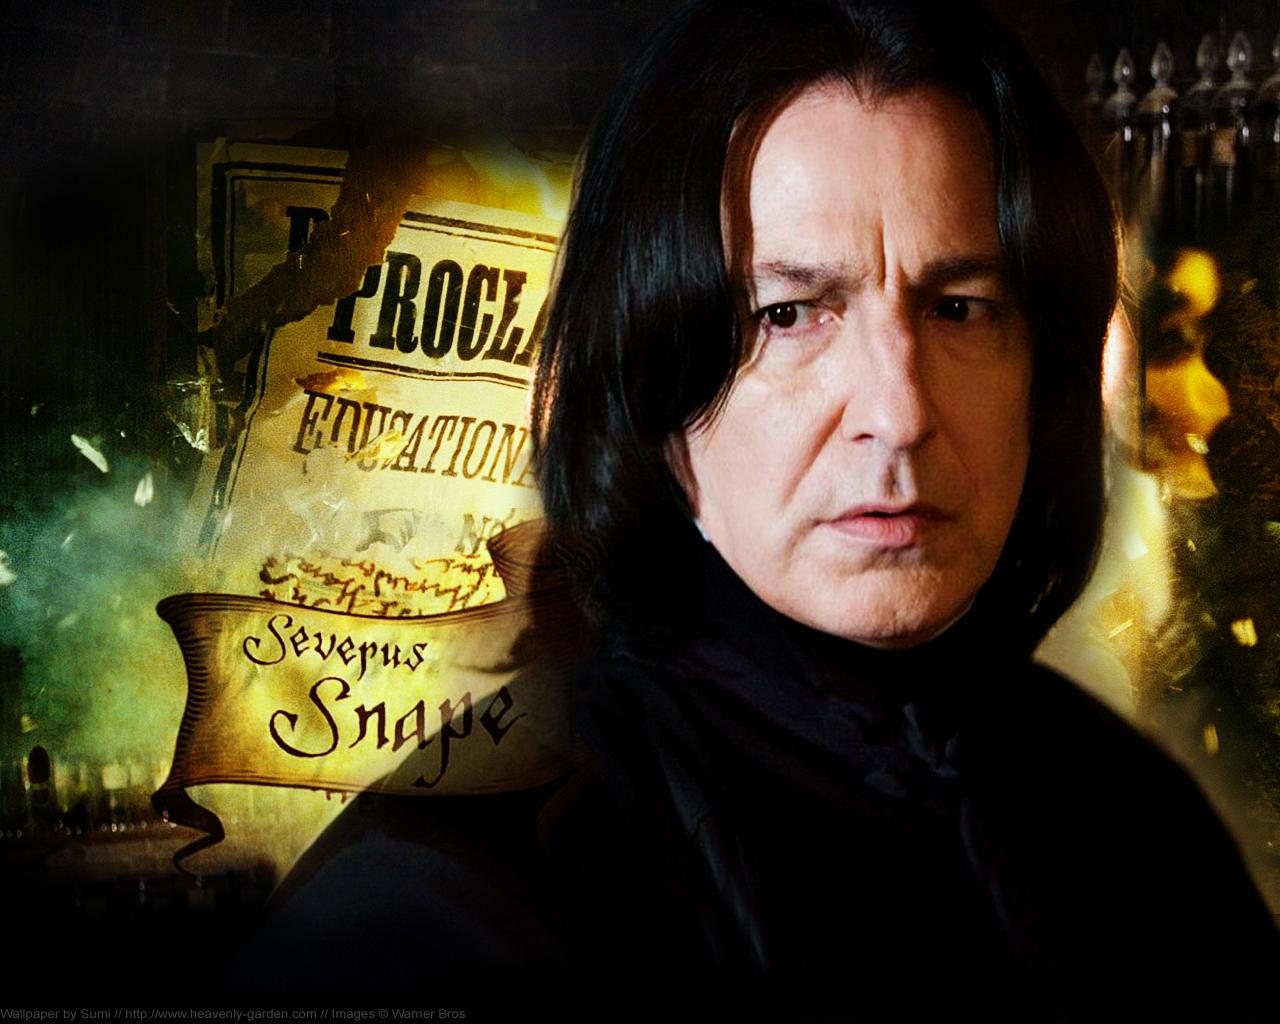 http://images1.fanpop.com/images/image_uploads/Severus-Snape-severus-snape-812081_1280_1024.jpg